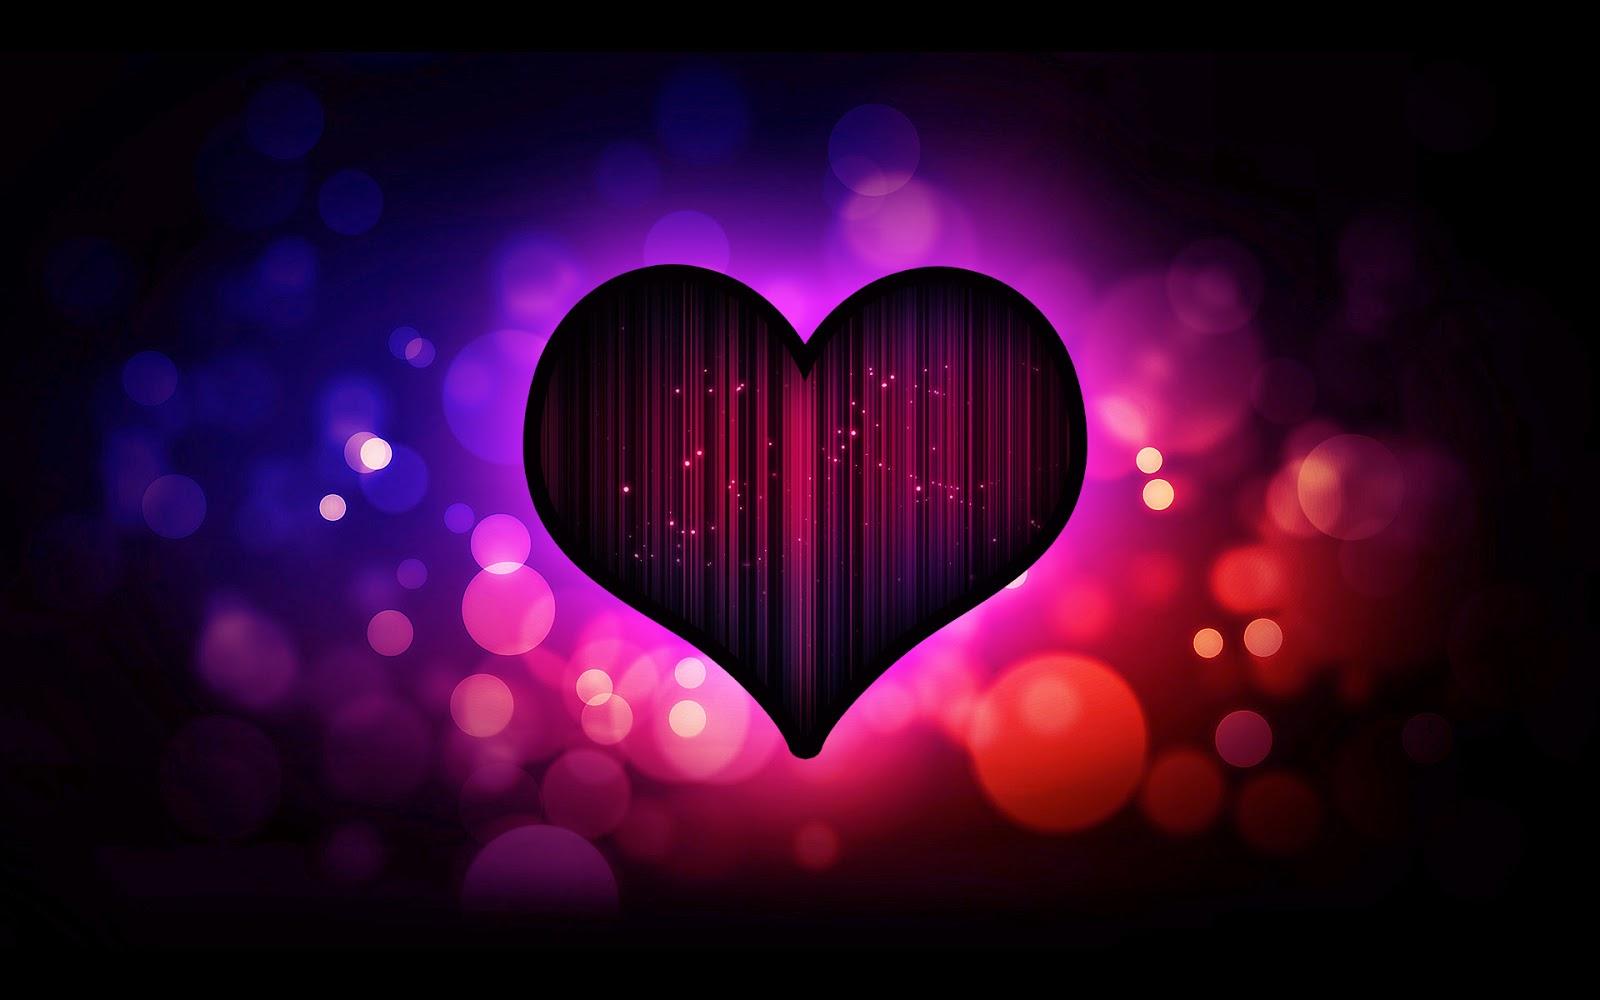 Beautiful Love Wallpaper For Mobile Phone Hd - Heart Background Hd - HD Wallpaper